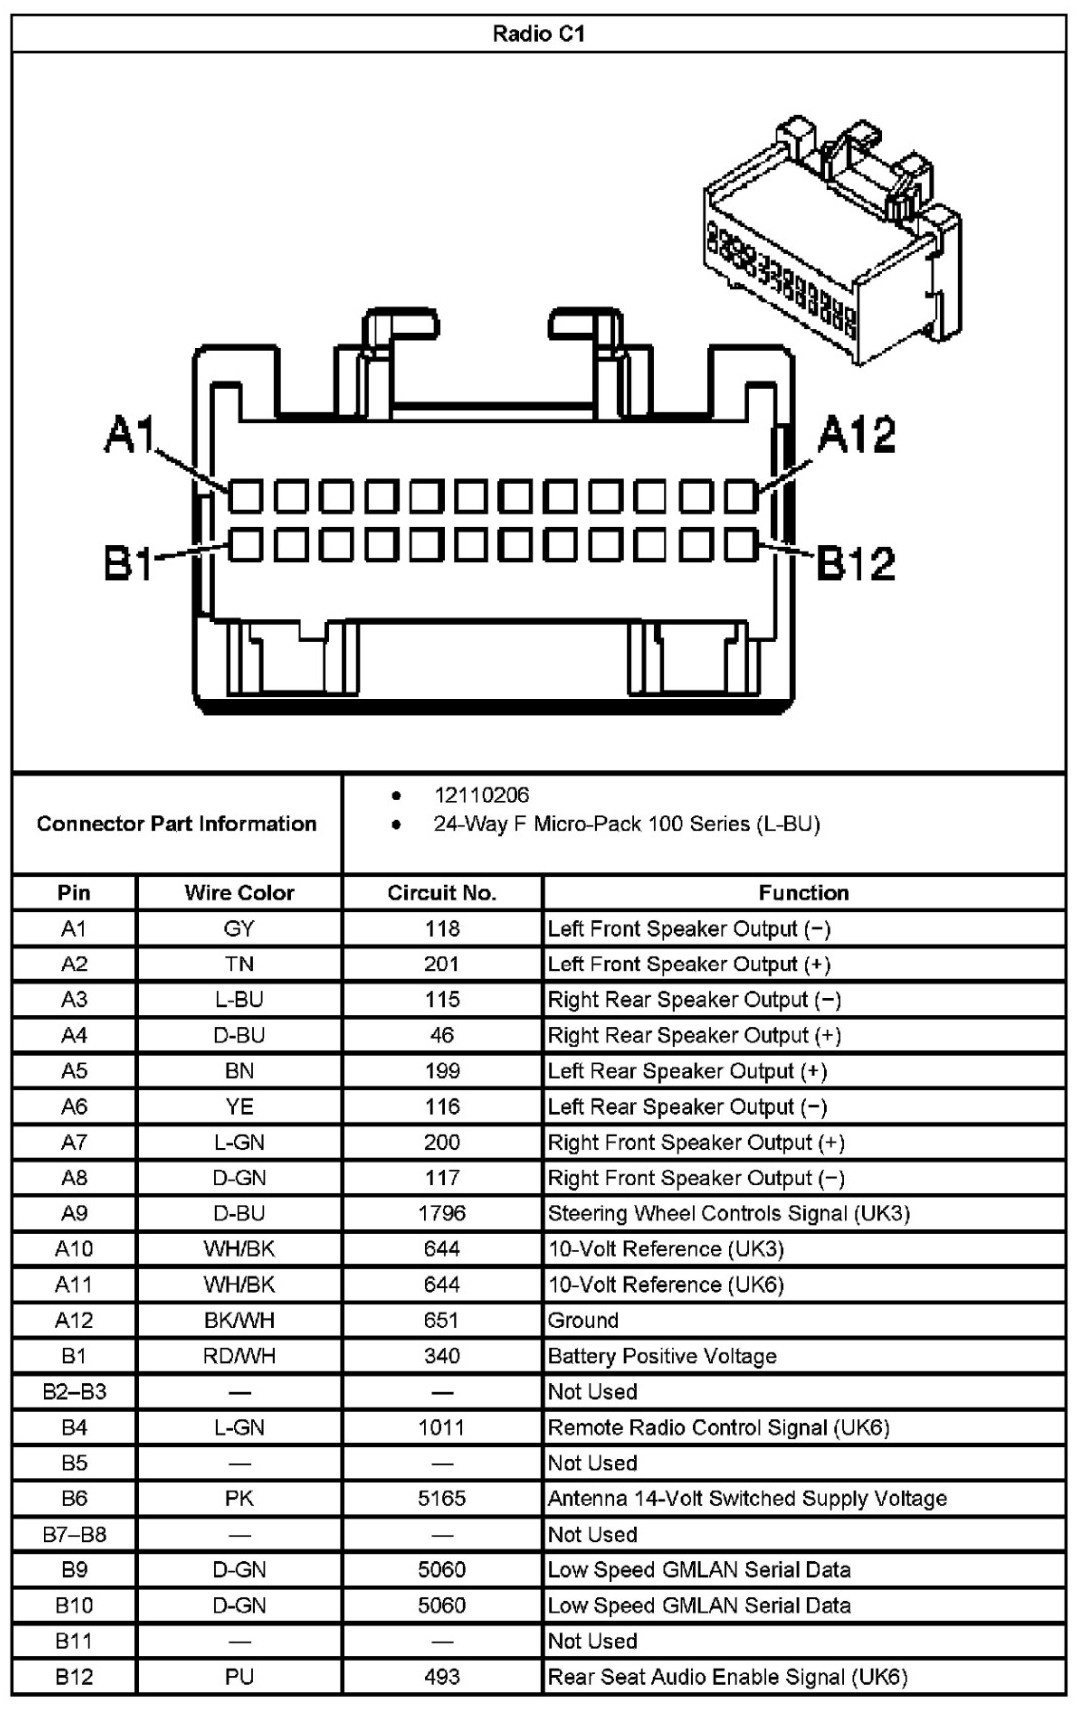 2003 Tahoe Radio Wiring - Wiring Diagram Data - 2001 Chevy Silverado Radio Wiring Diagram